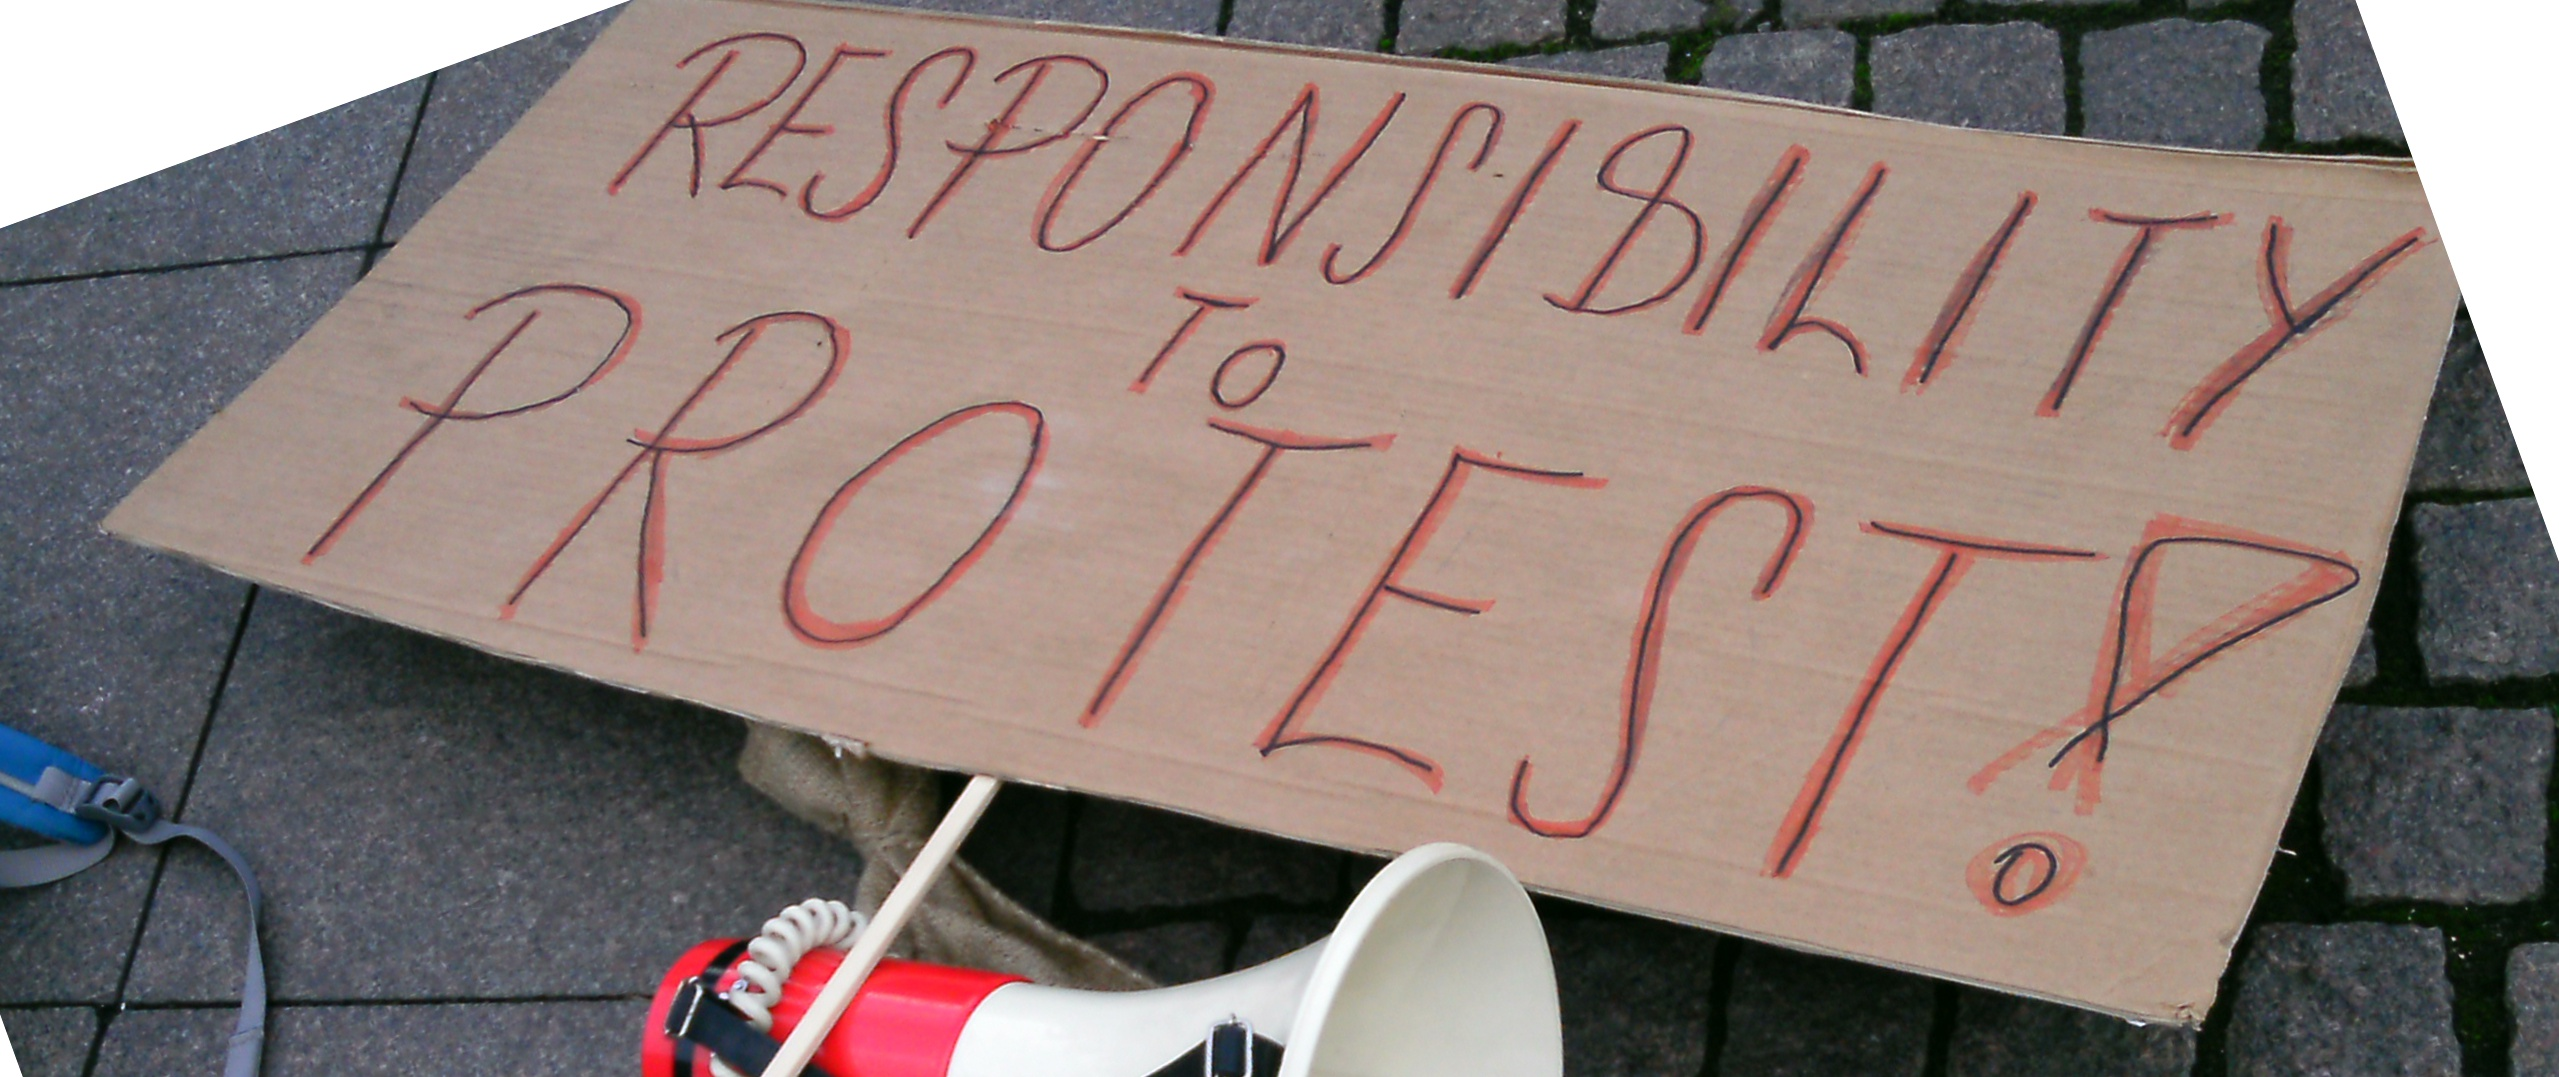 Bild: Initiative echte soziale Marktwirtschaft (IESM), via Pixelio.de